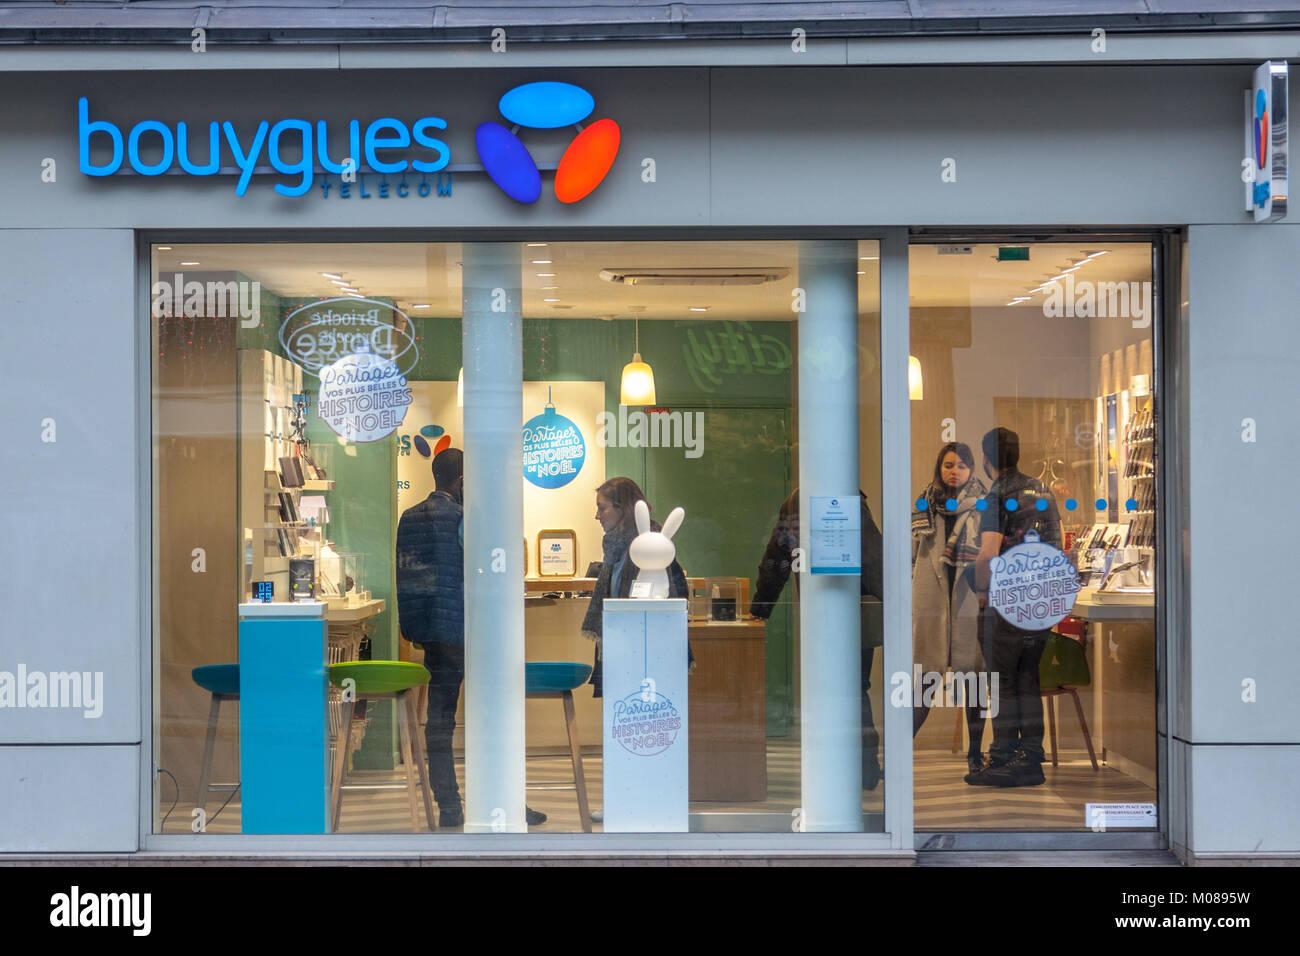 PARIS, FRANCE - DECEMBER 20, 2017: Bouygues Telecom logo on their main shop on Rue de Rivoli avenue. Bouygues Telecom - Stock Image